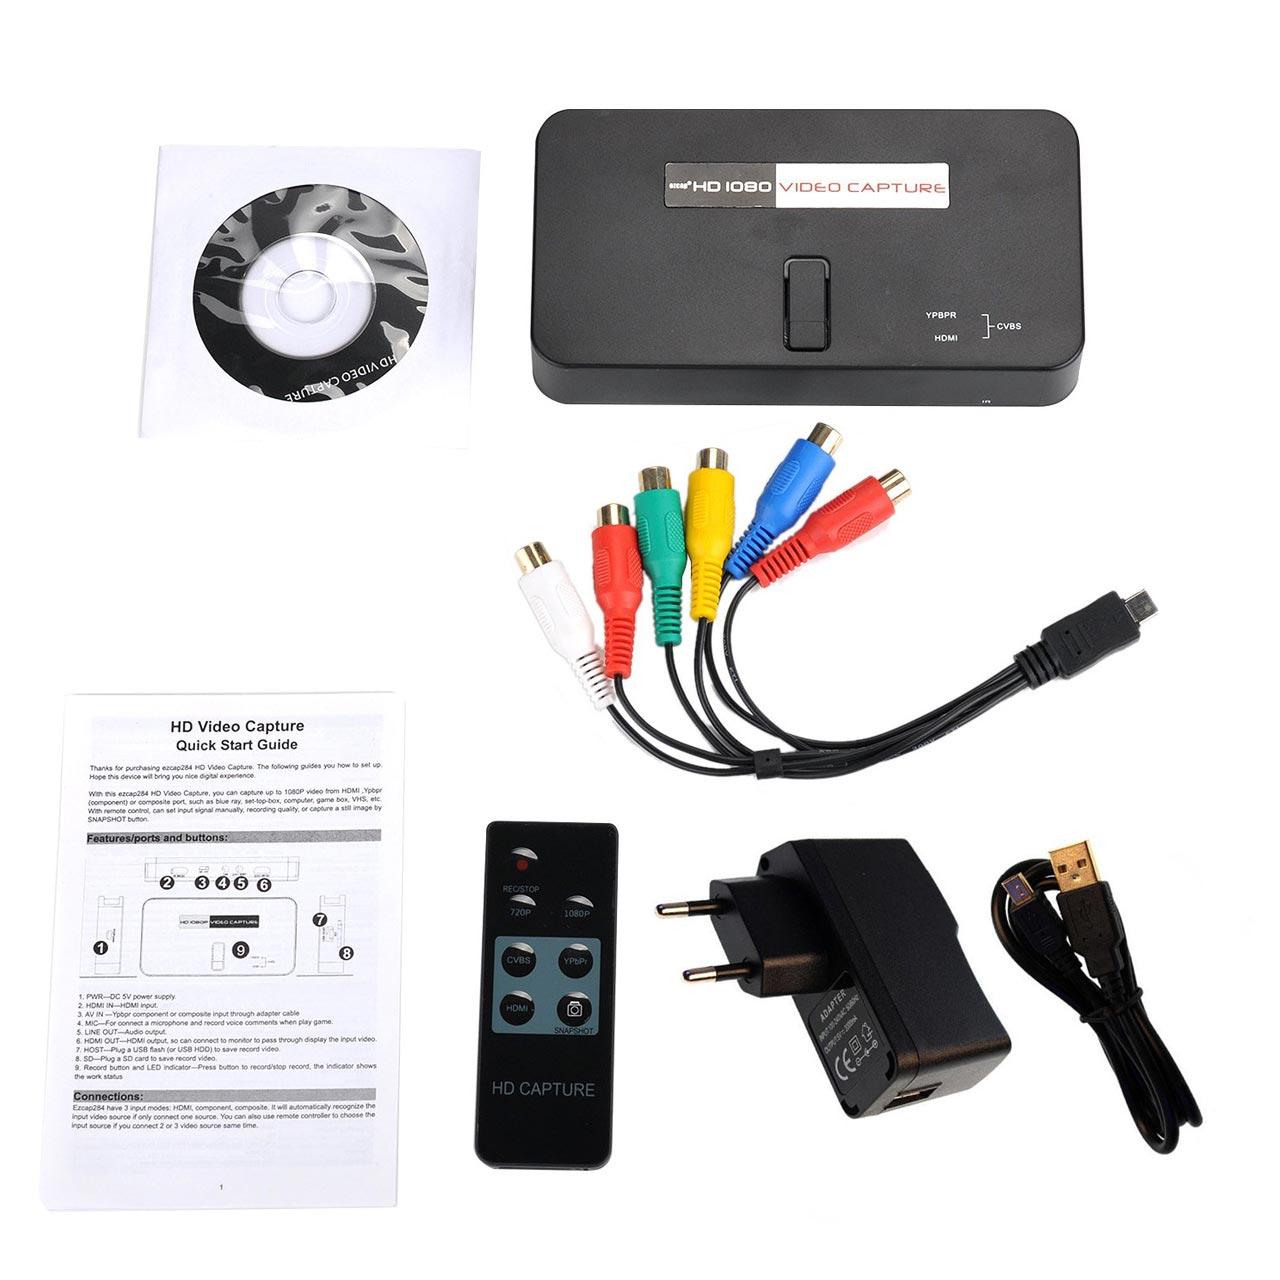 کارت کپچر حرفه ای EZCAP 284 با ورودی HDMI و ورودی کامپوننت و AV